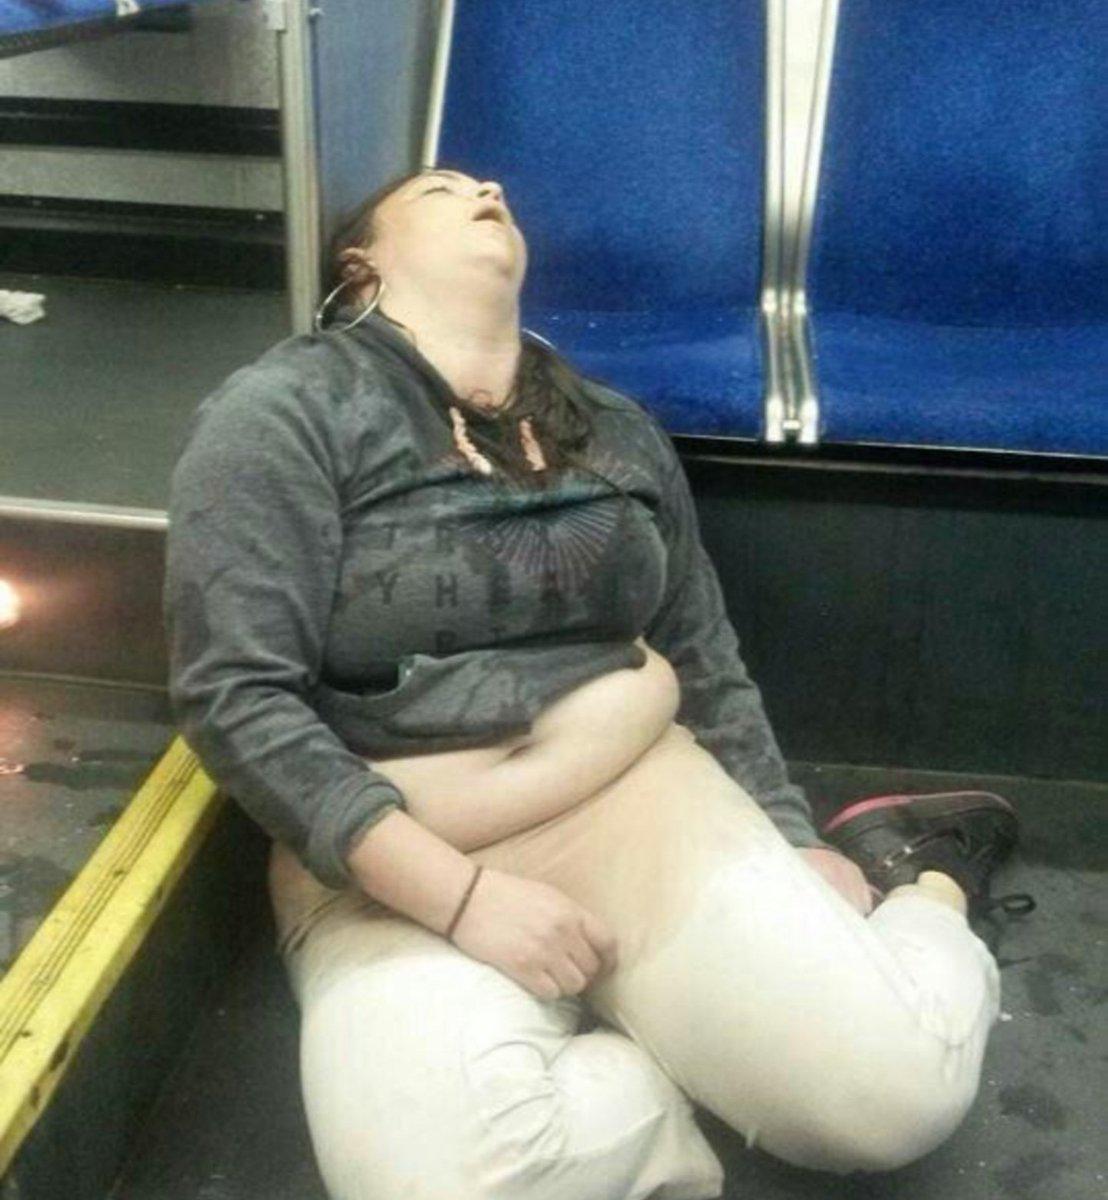 RT @Prophetspeaks_: Sleeping beauty waiting for...